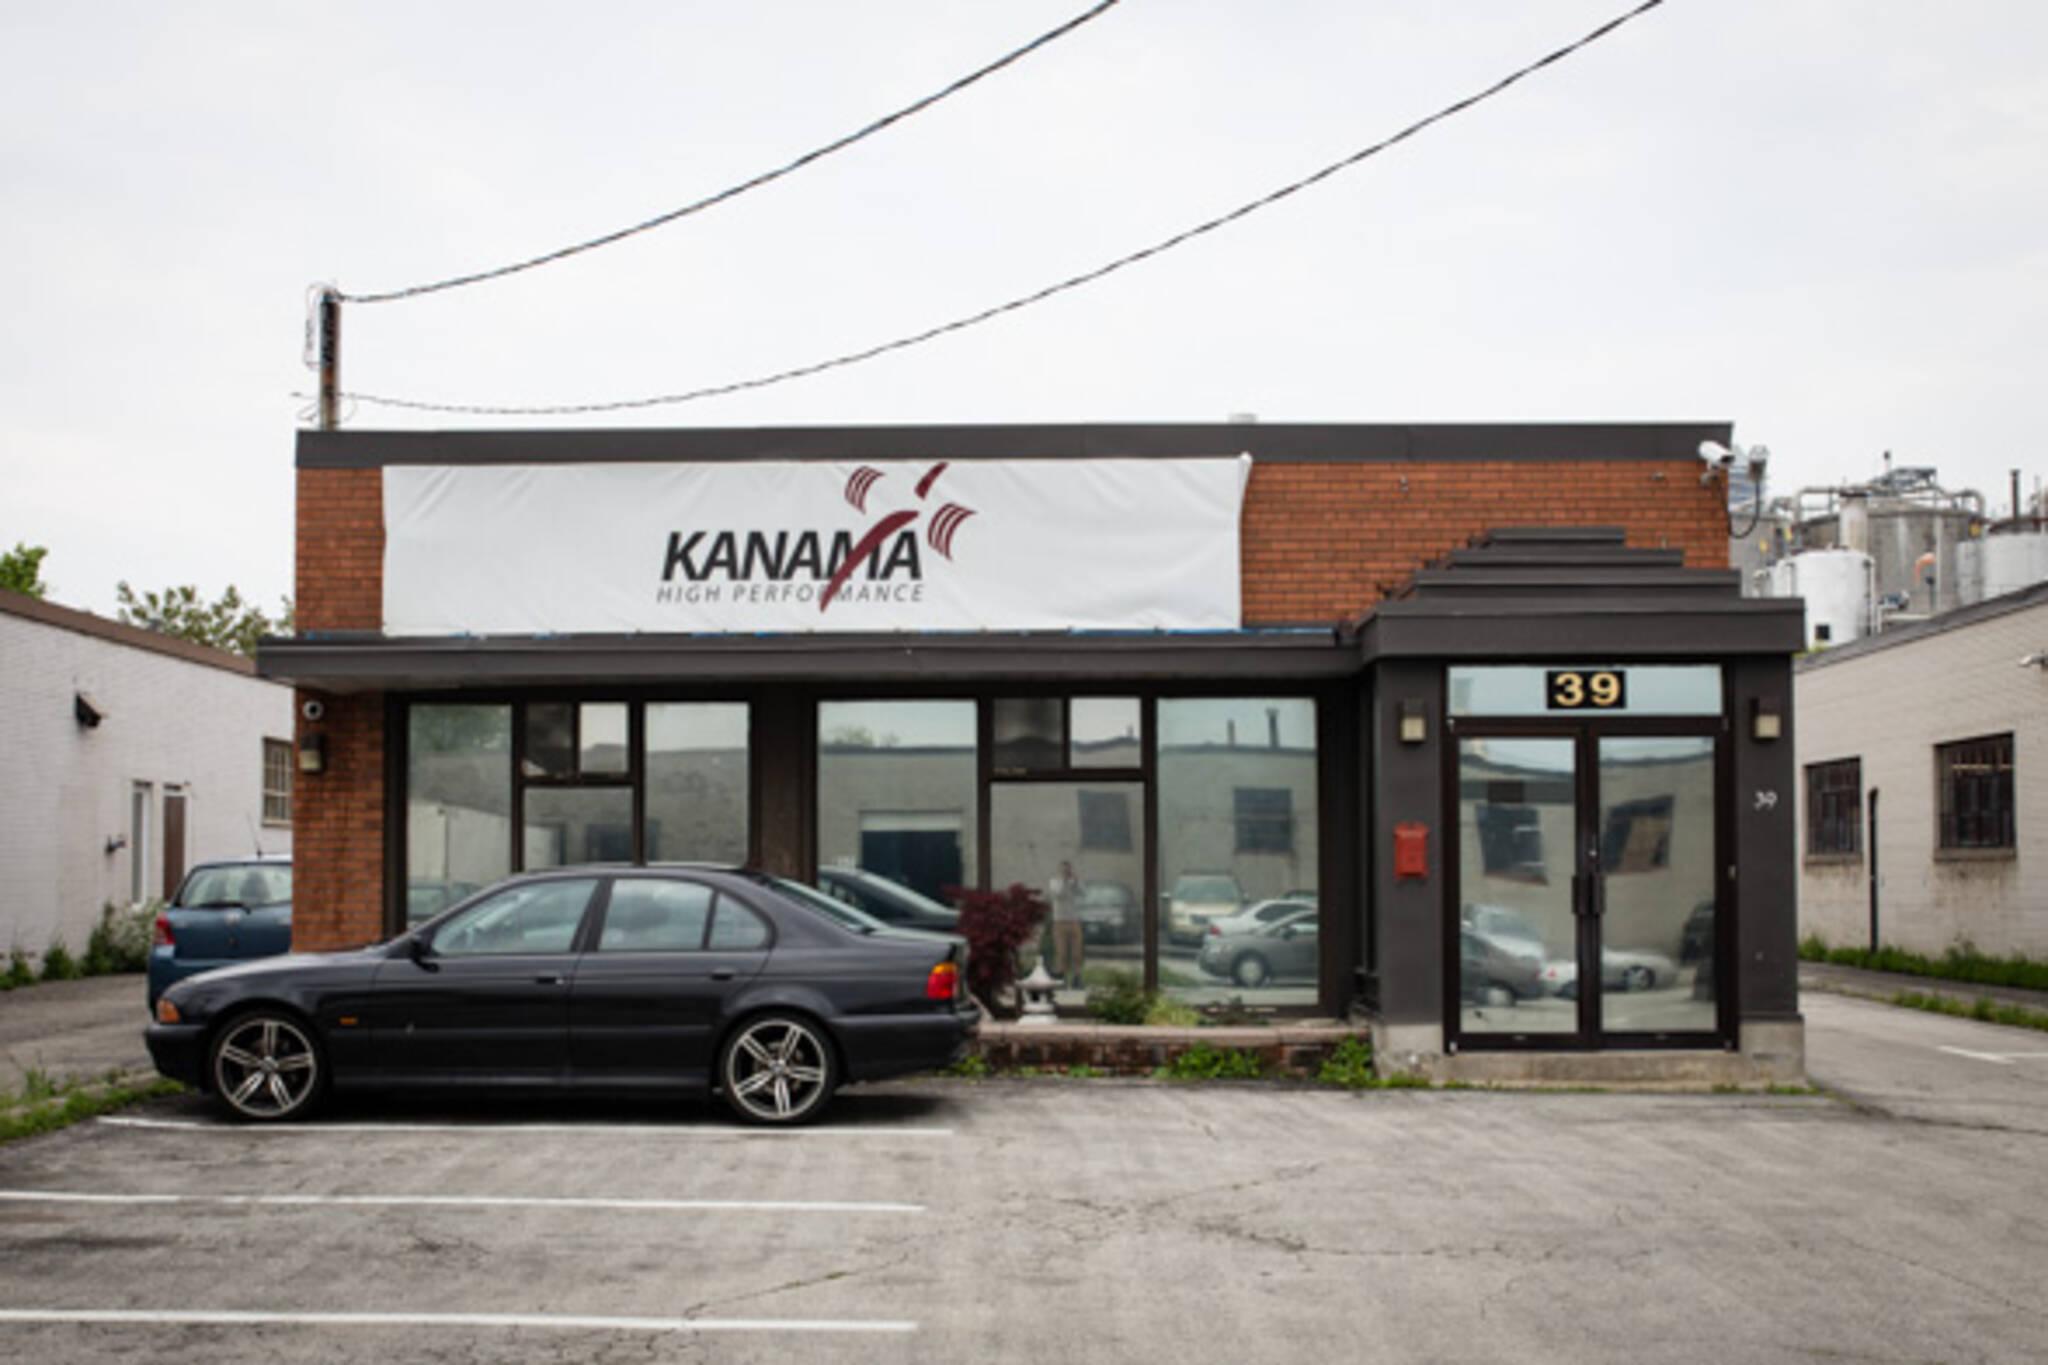 Kanama High Performance Toronto